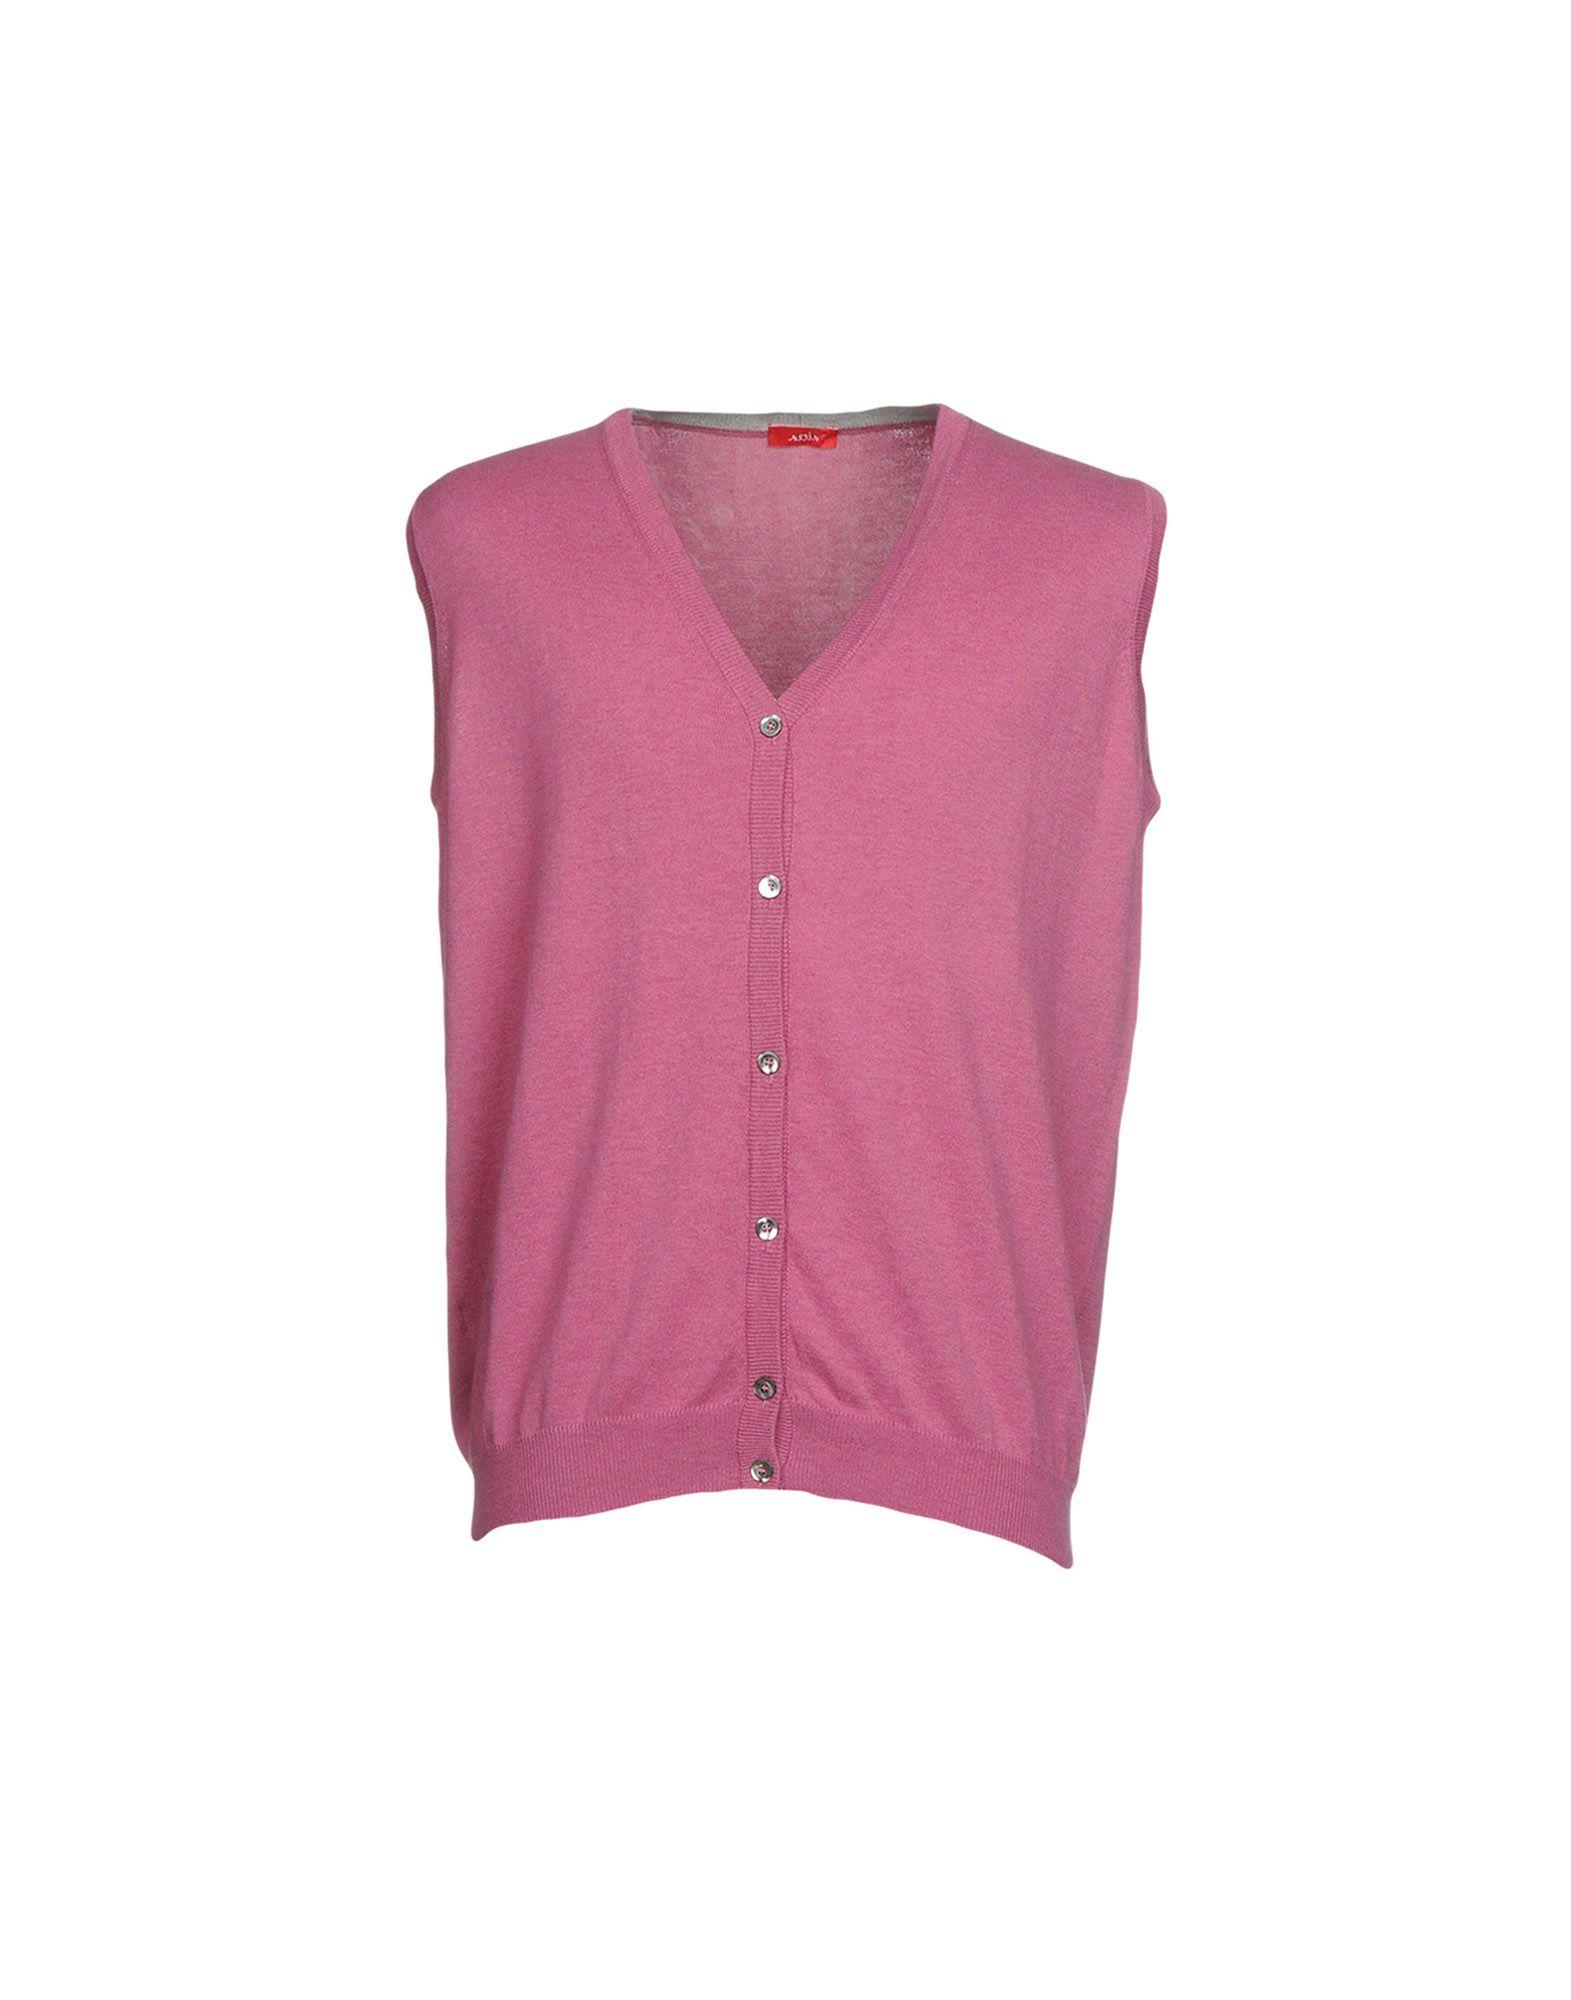 ALTEA dal 1973 Кардиган altea dal 1973 джинсовая рубашка